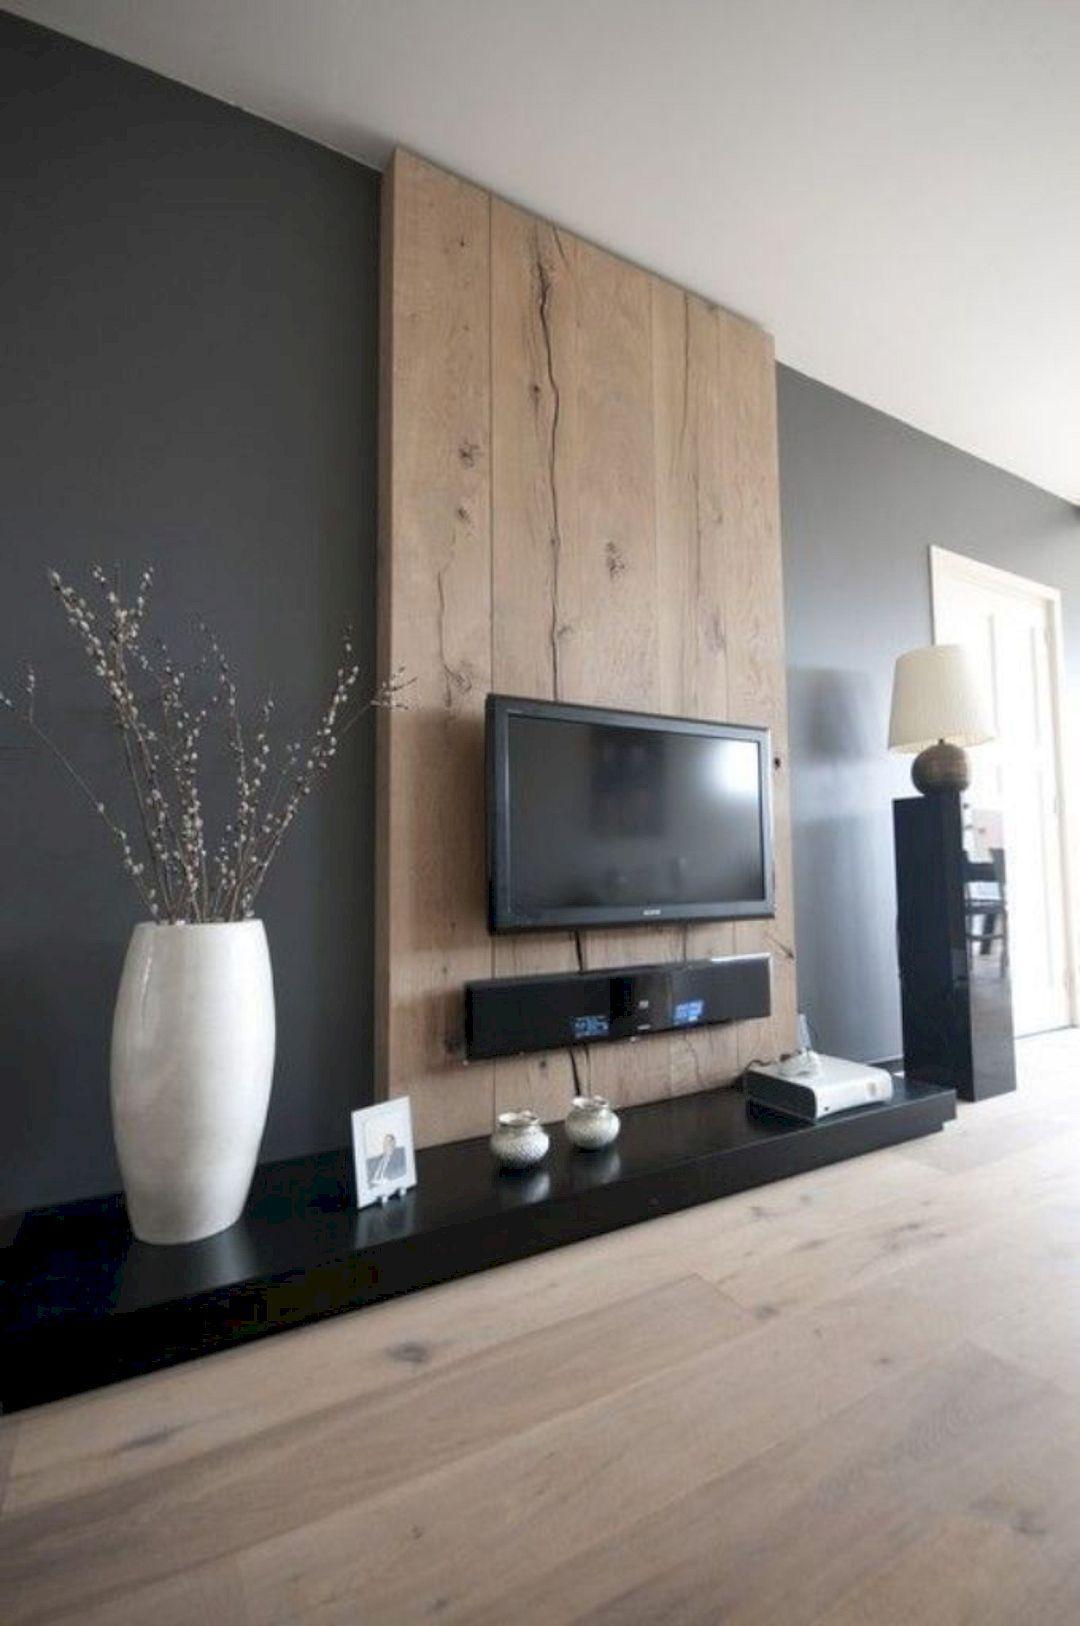 16 interior design ideas for led tv https www futuristarchitecture com